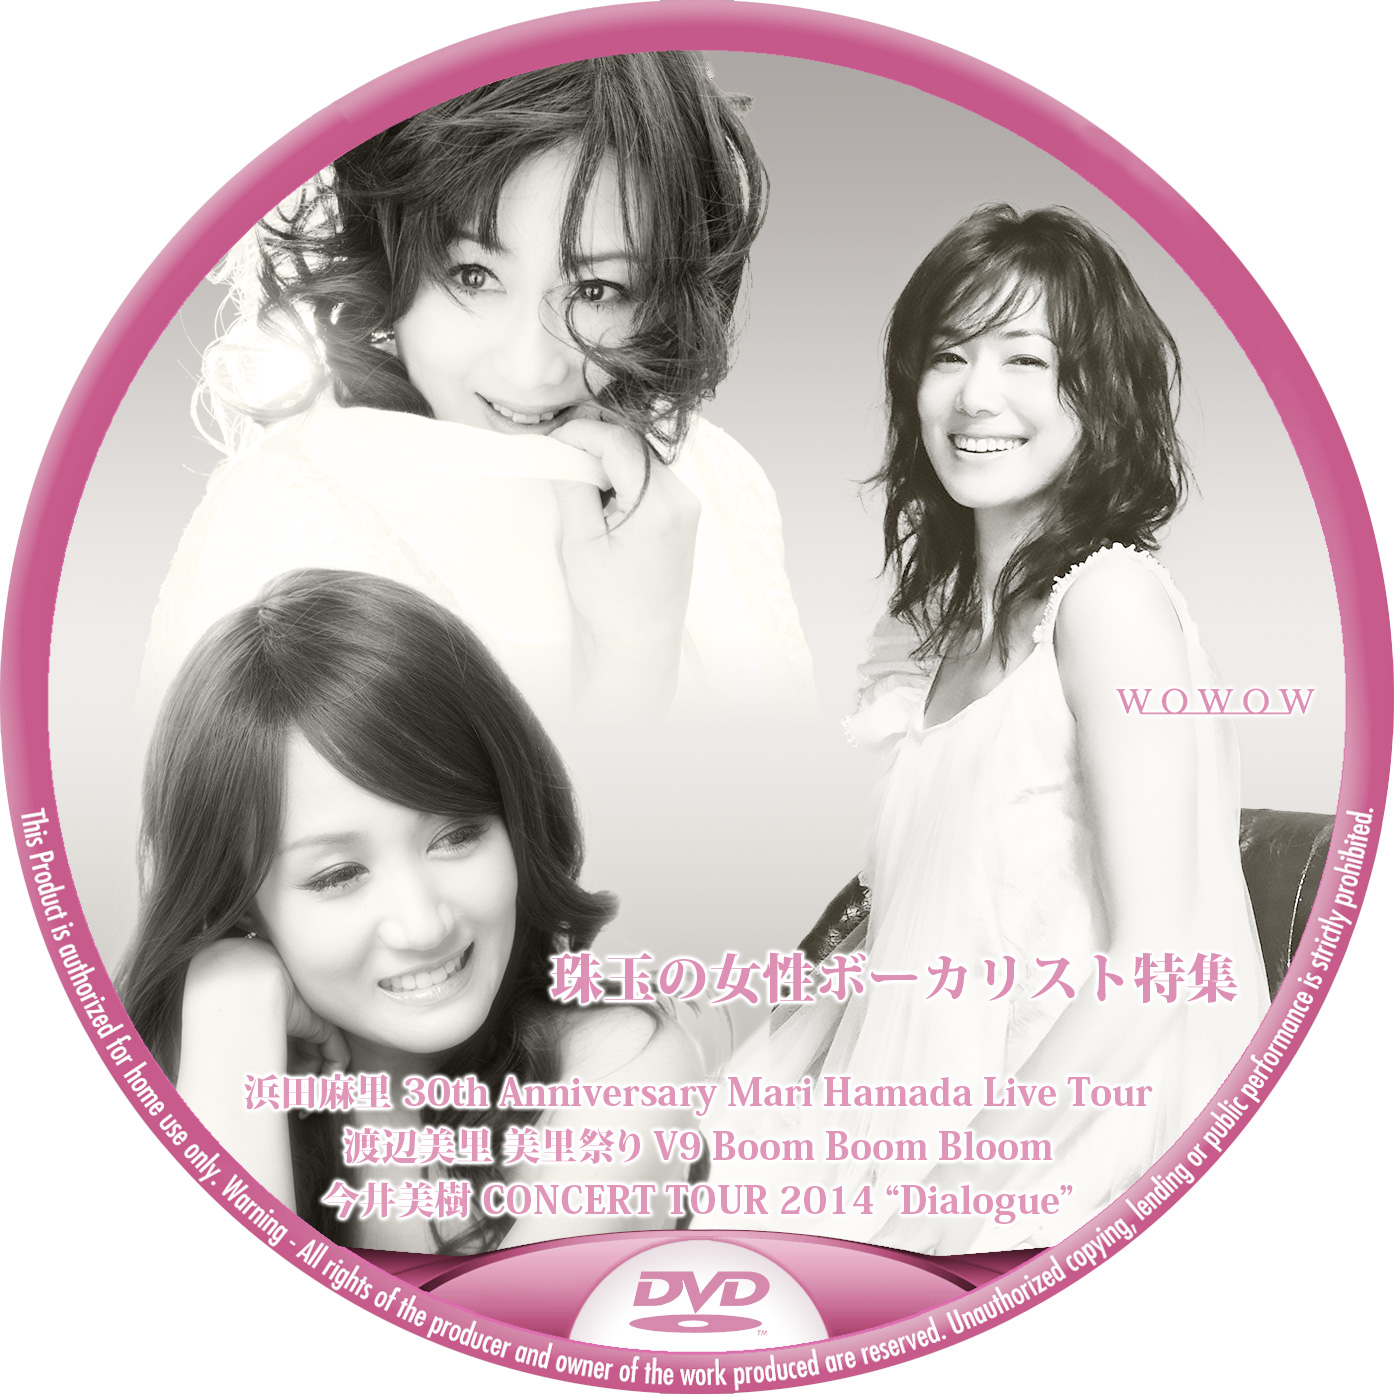 浜田麻里 渡辺美里 今井美樹 WOWOW DVDラベル